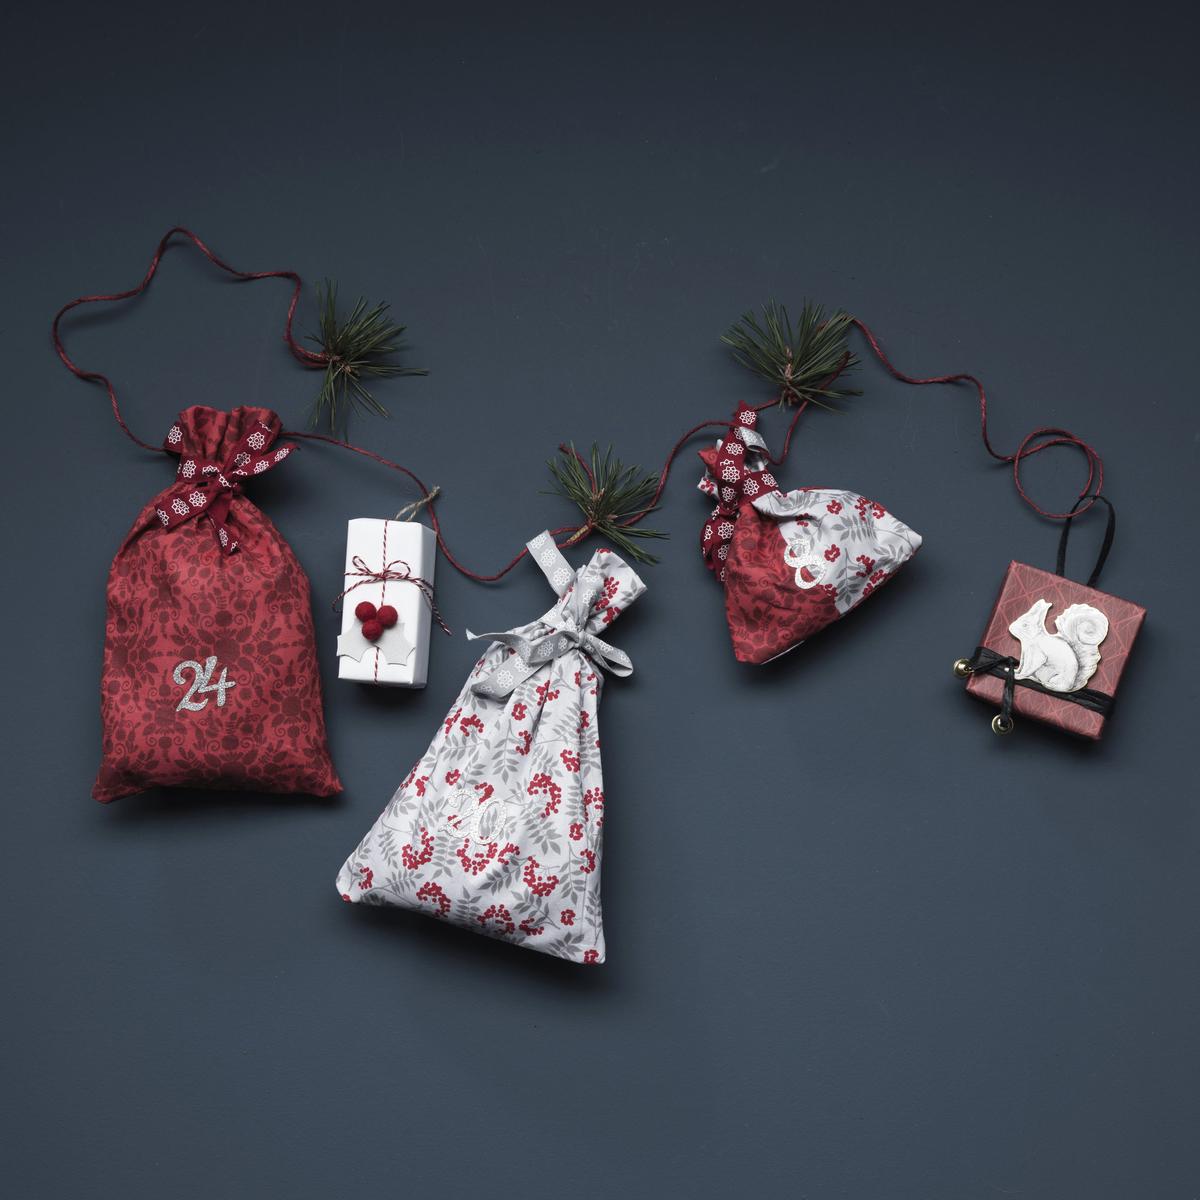 Sy en julkalender